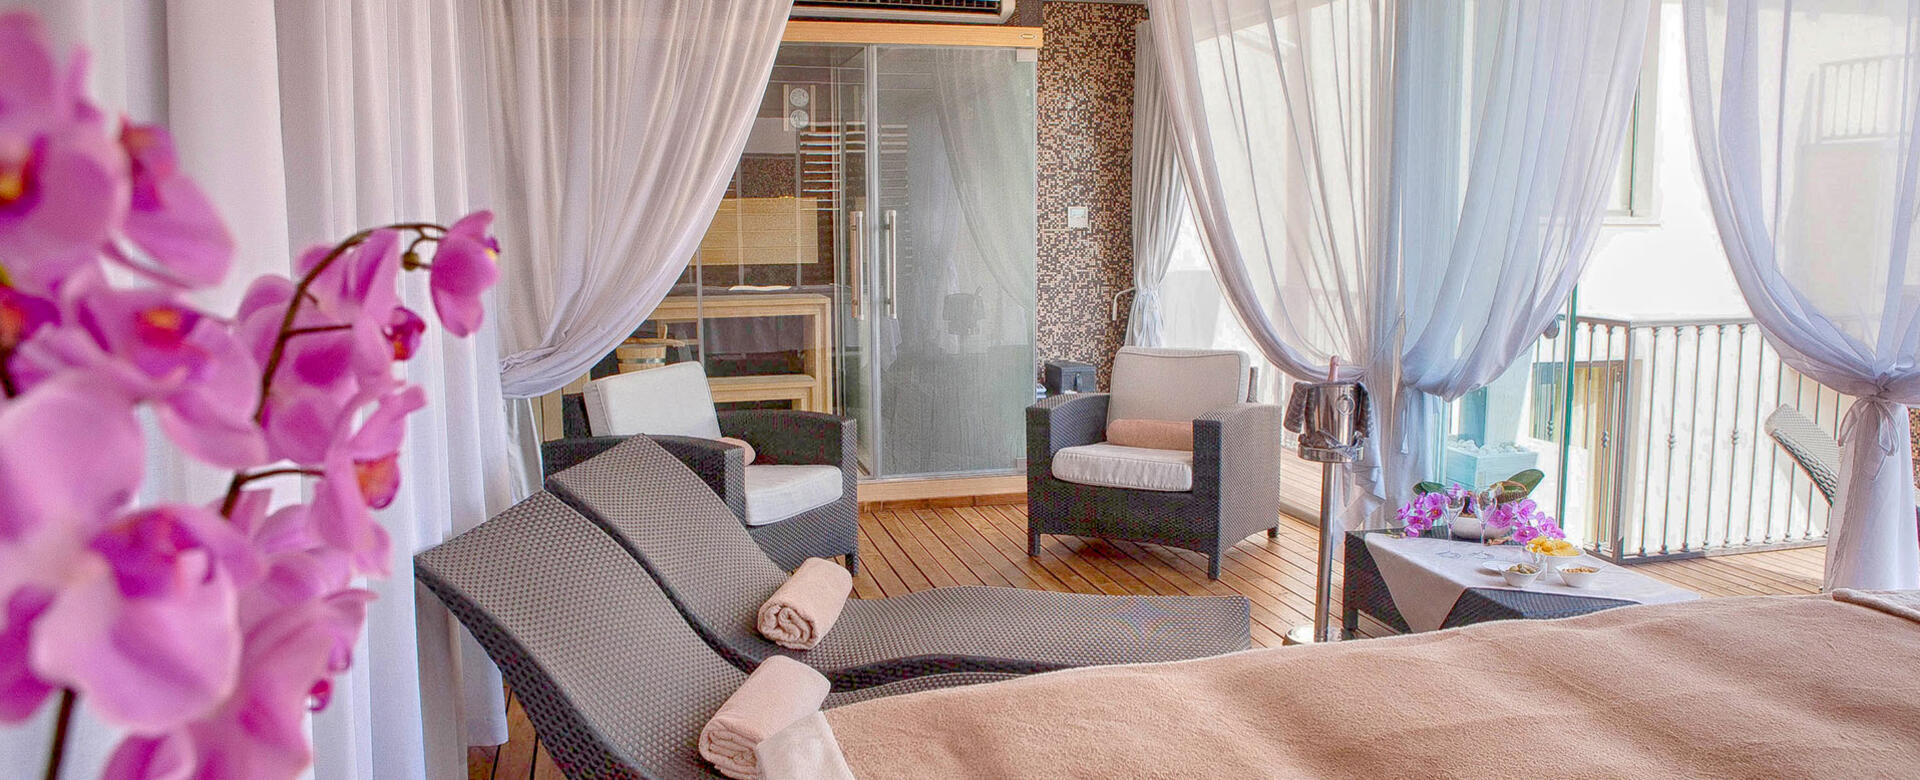 hotelvillaluisa de private-spa 004